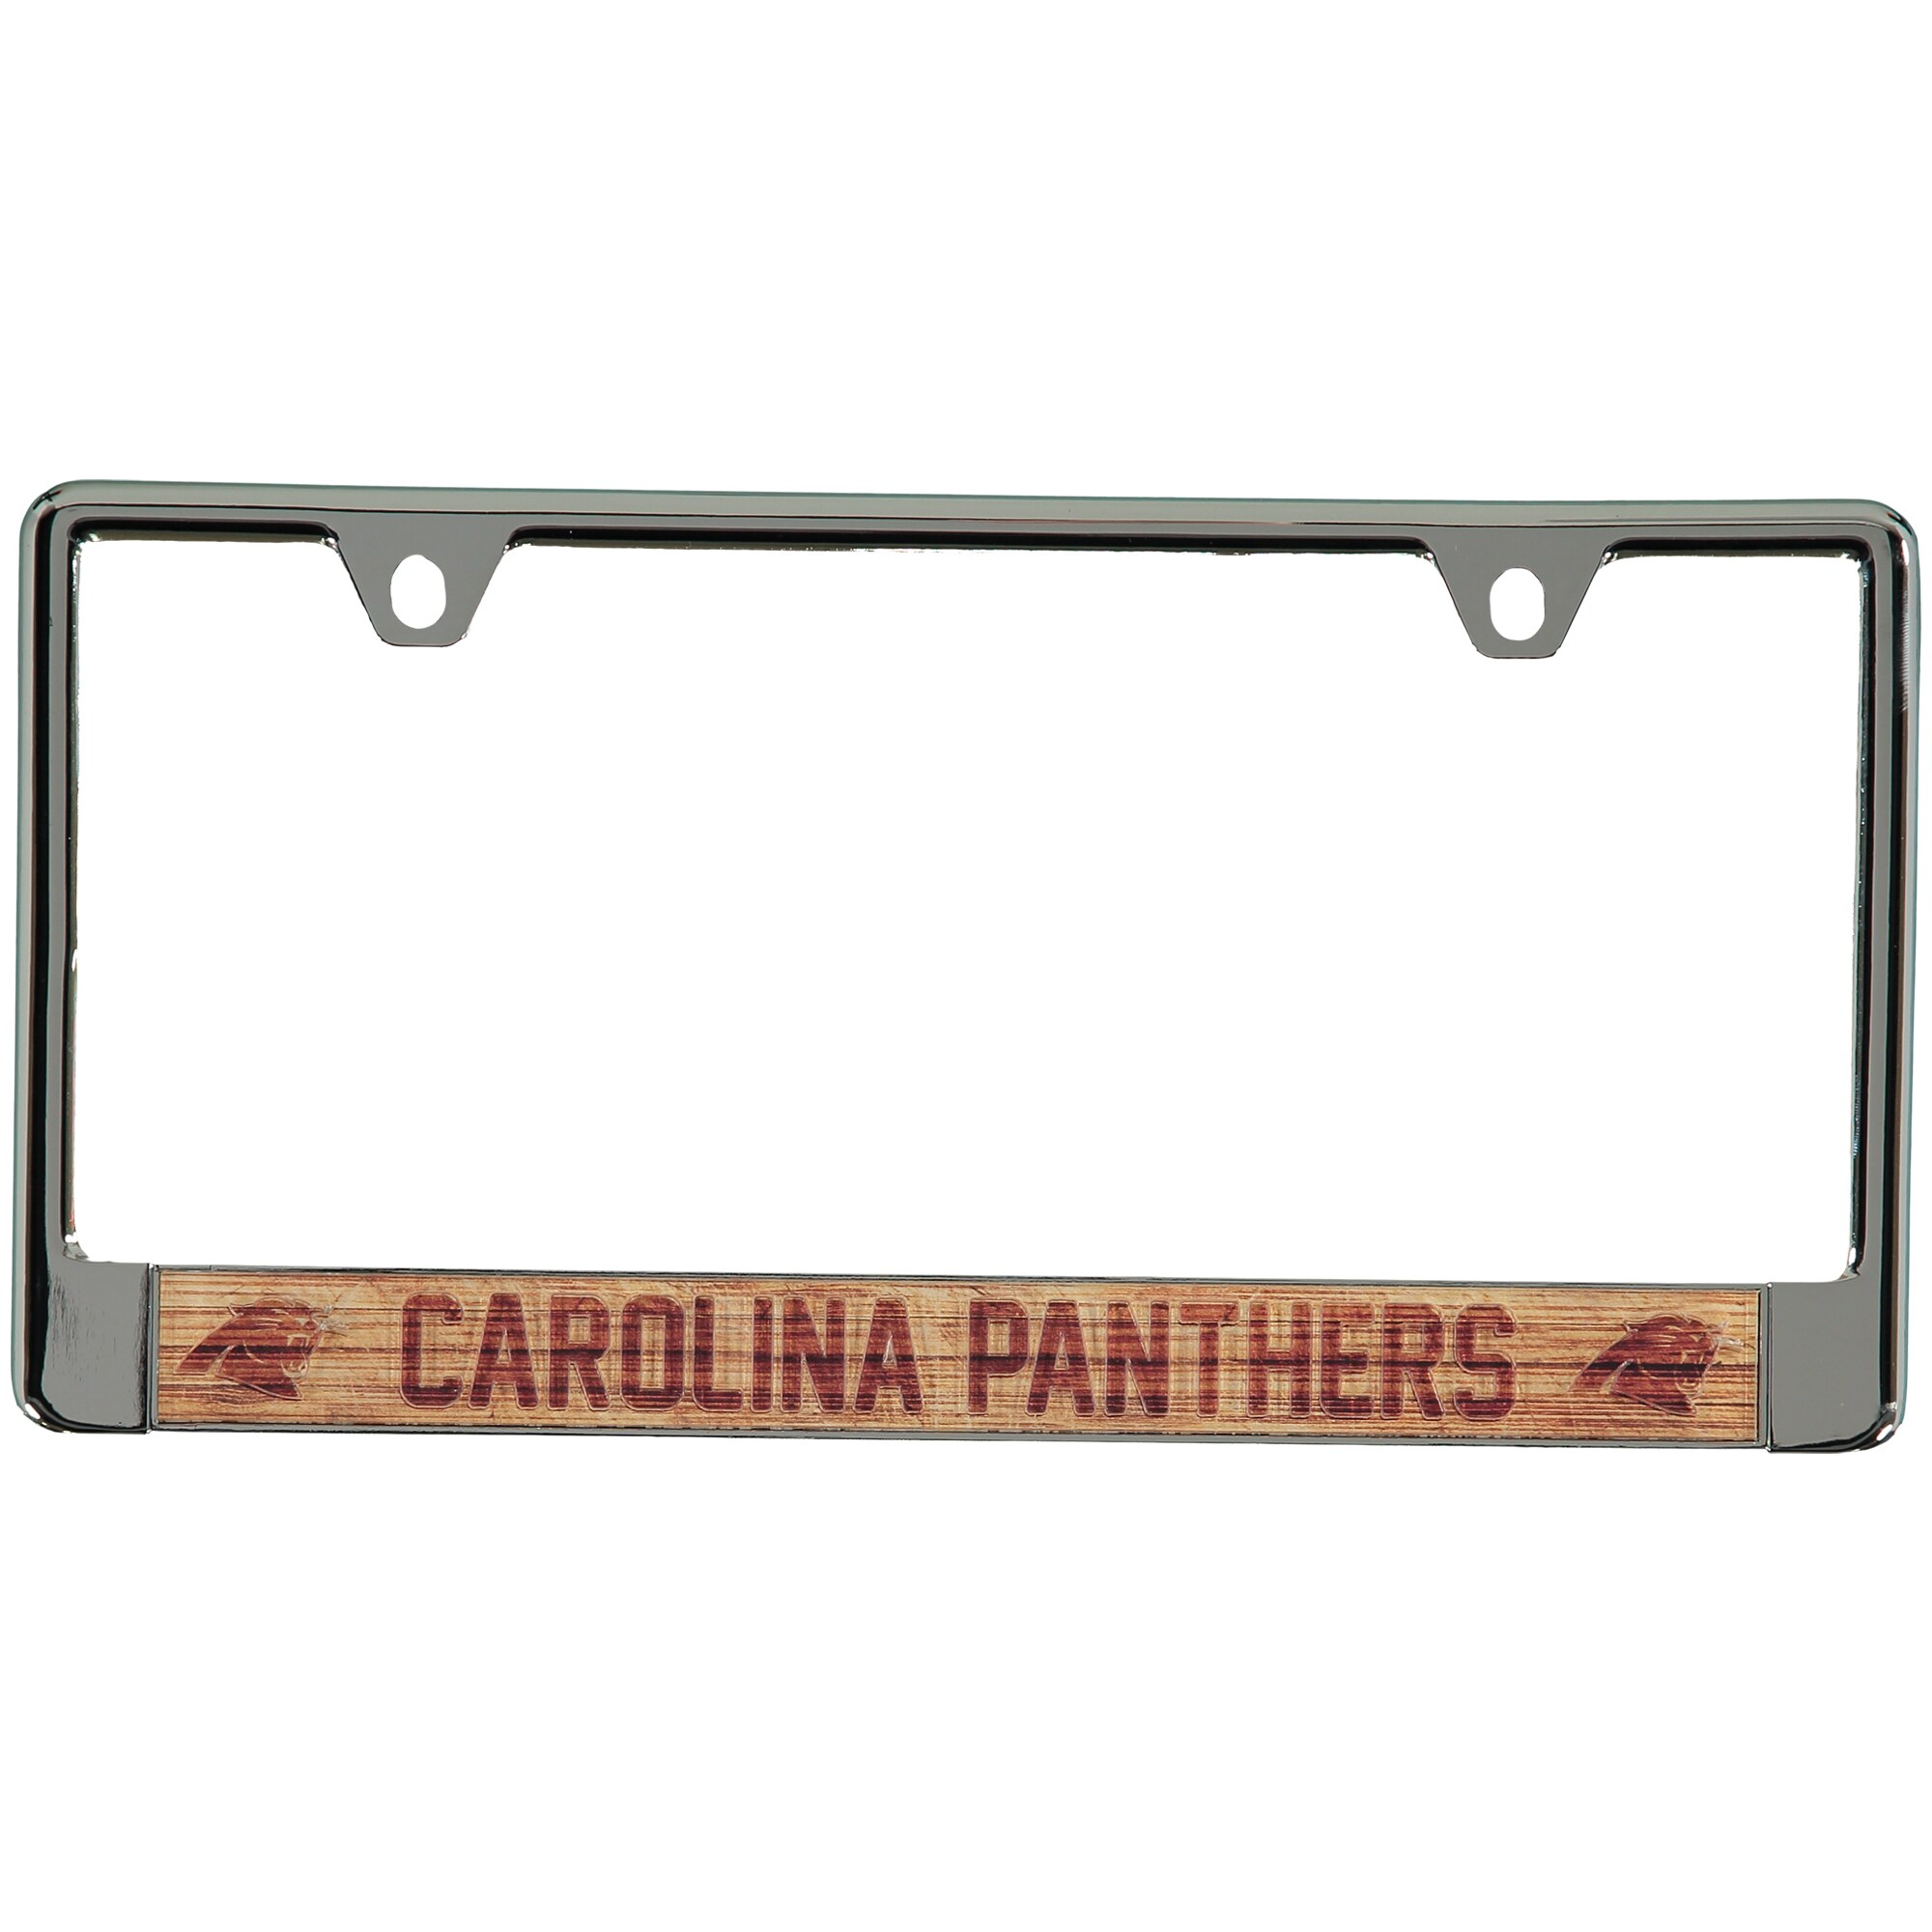 Carolina Panthers Wood Design Acrylic License Plate Frame